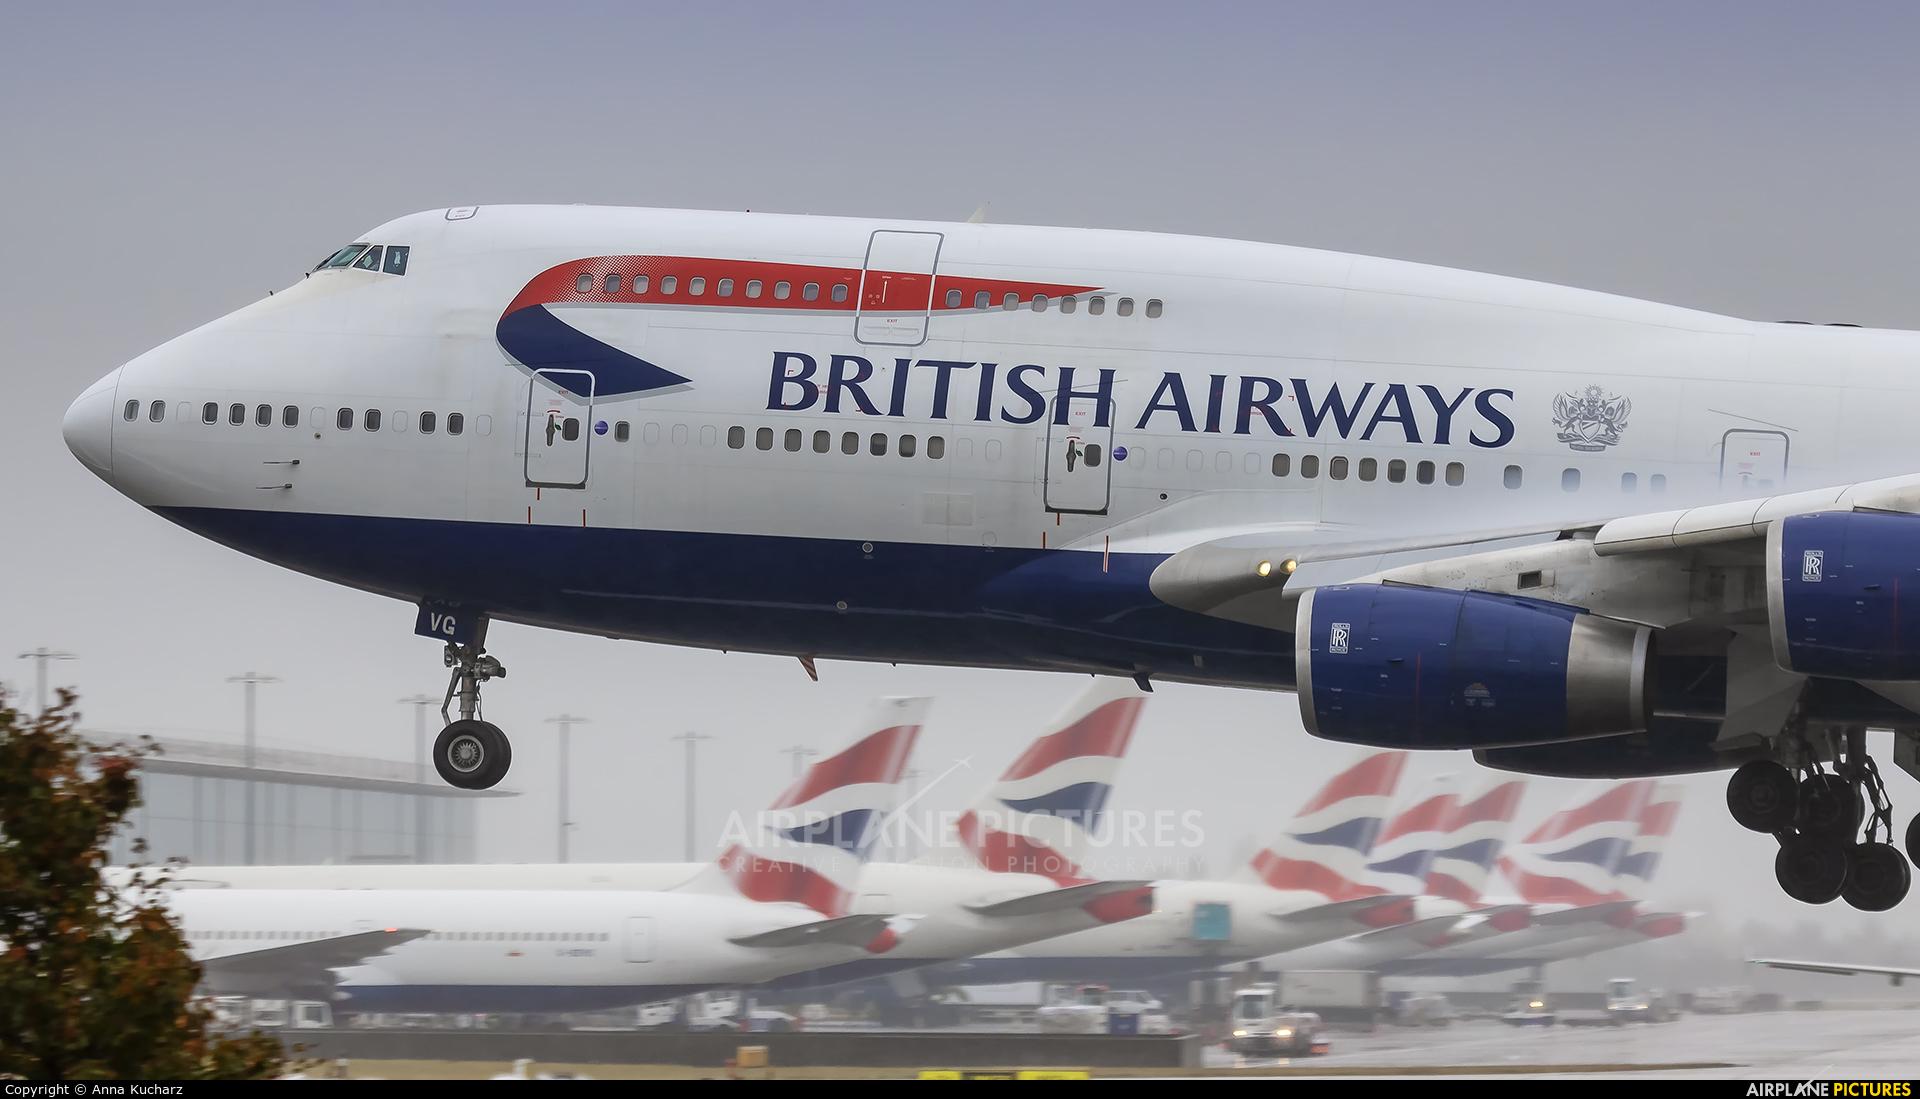 British Airways G-CIVG aircraft at London - Heathrow